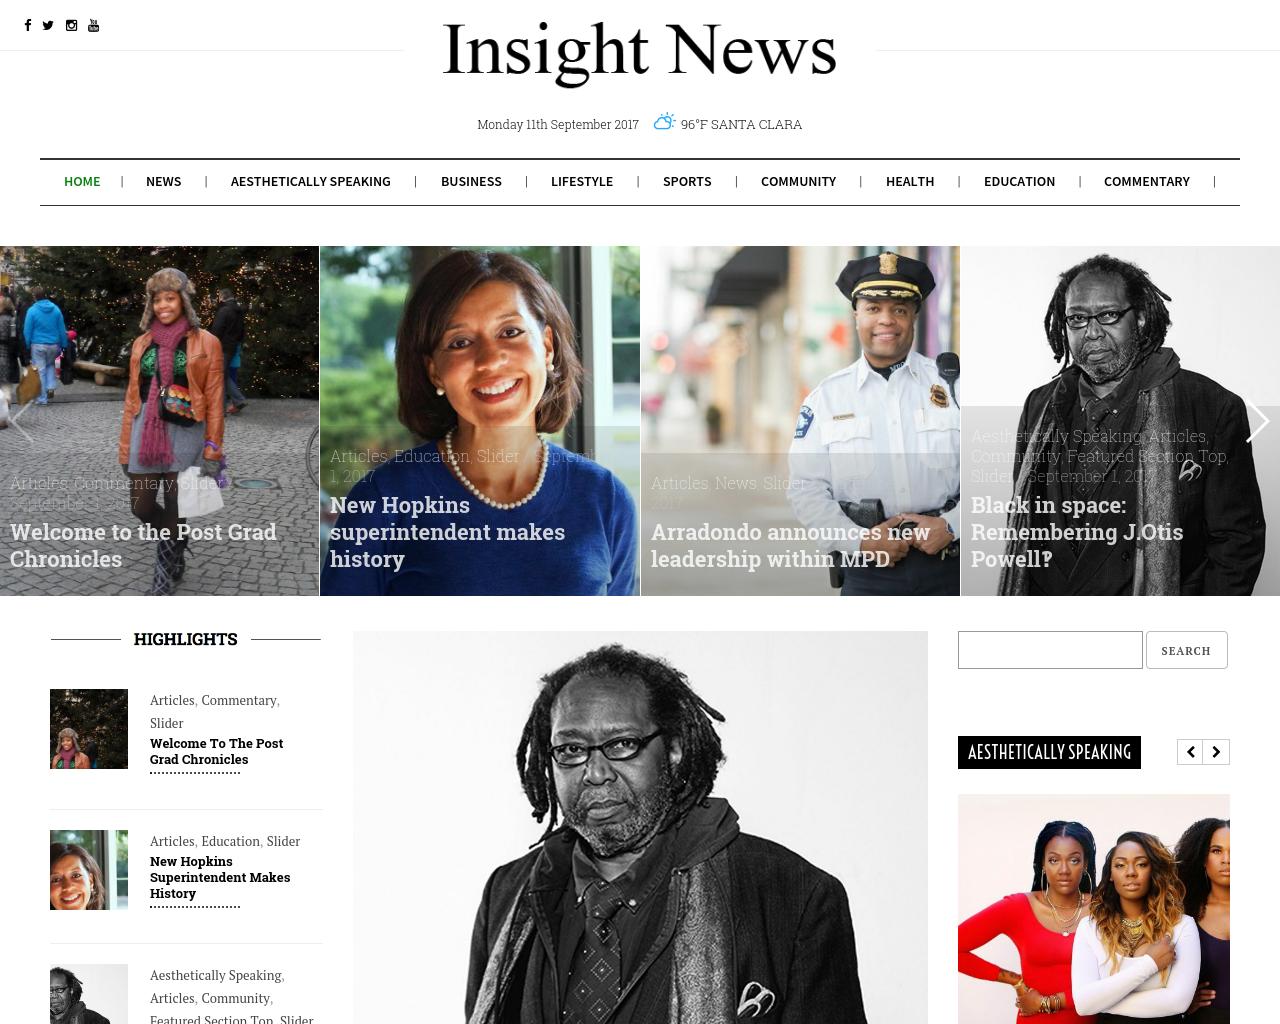 InsightNews-Advertising-Reviews-Pricing